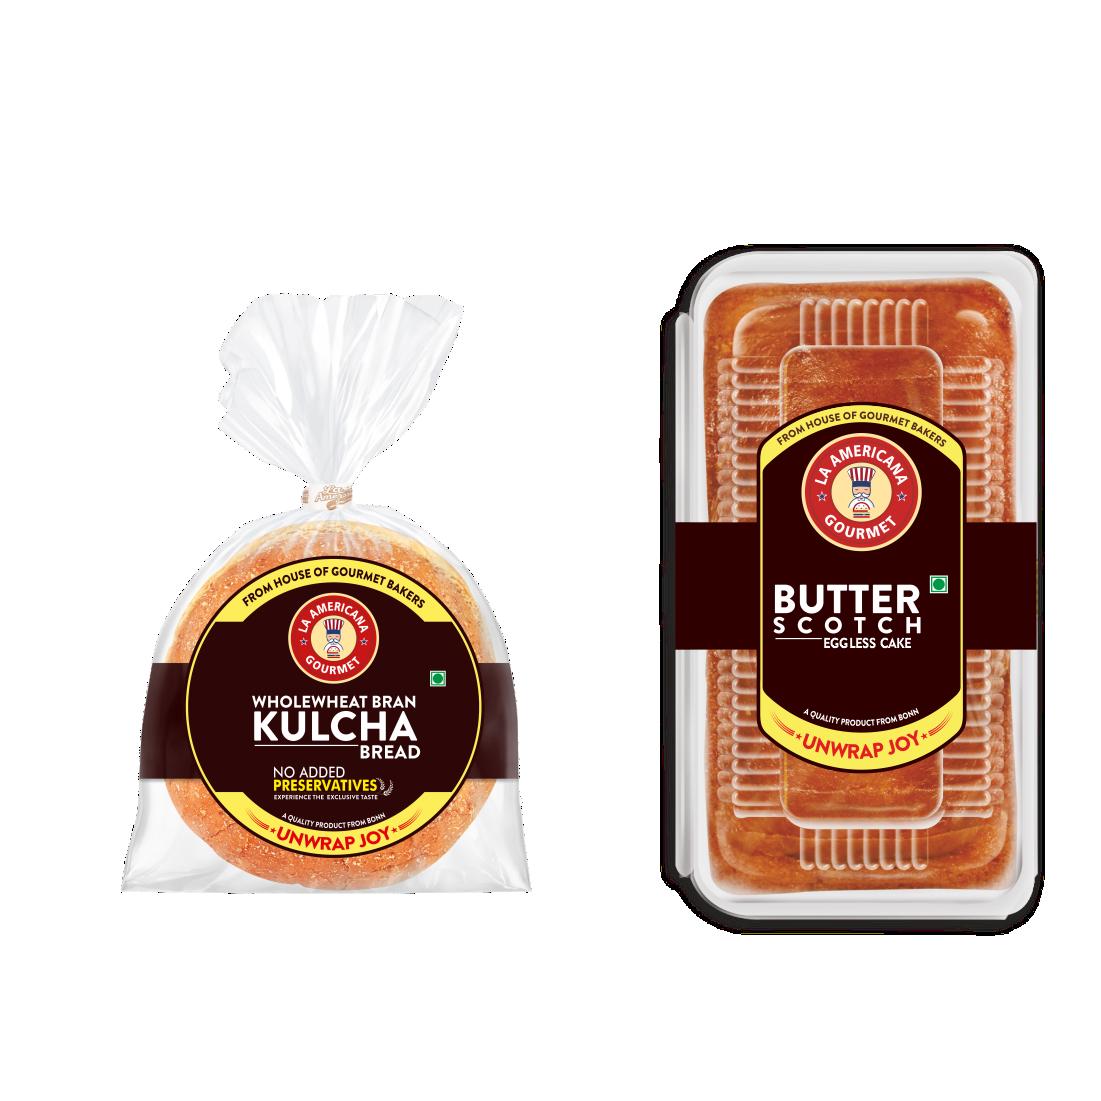 LA Americana wholewheat Bran Kulcha bread 200g (2 Packs) and Eggless Butter Scotch Cake 200g (1 Pack)